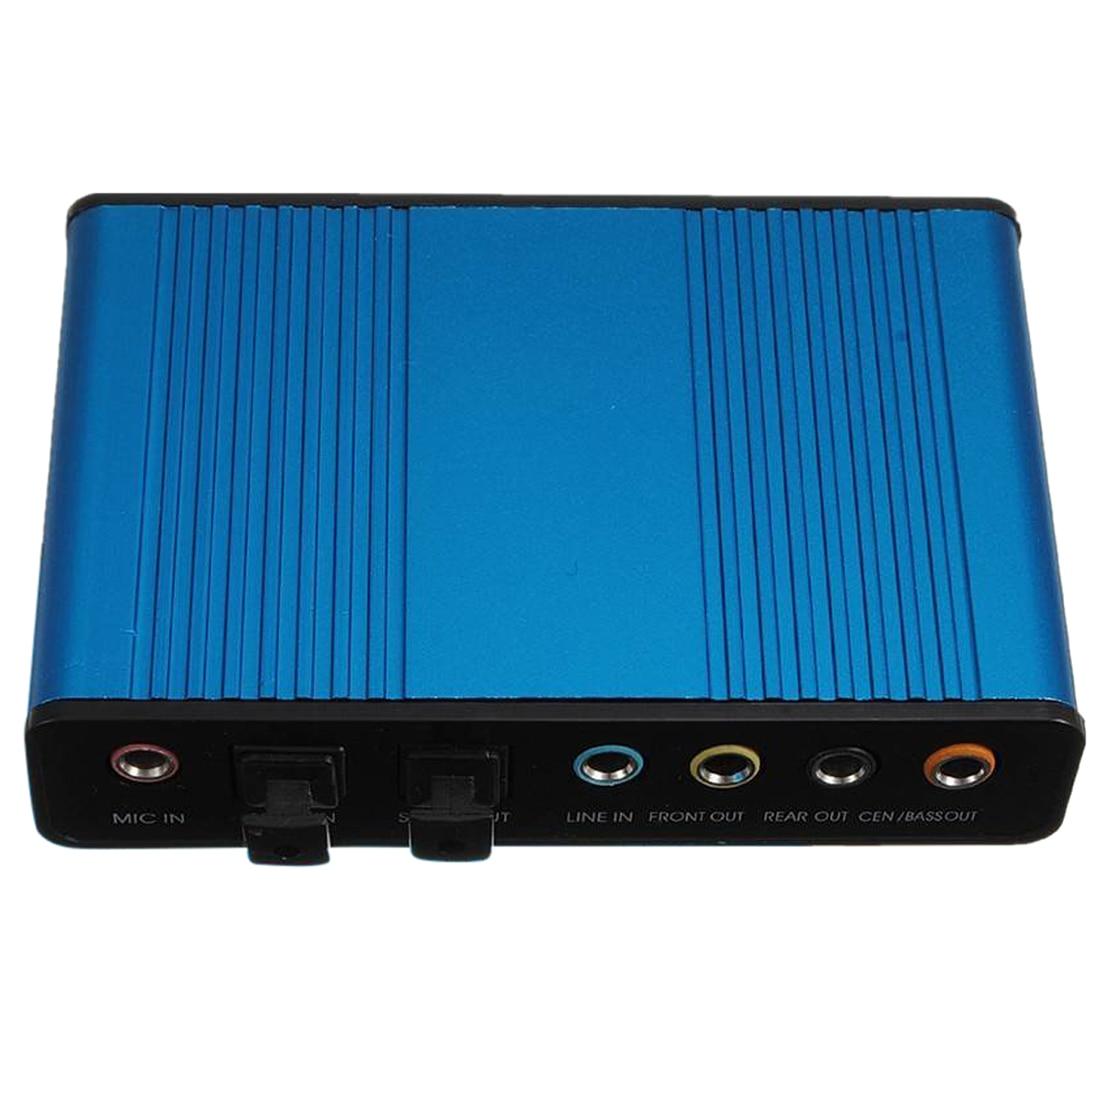 Blue External USB 6 Channel 5.1 External Audio Sound Card Optical Audio S / PDIF Optical Sound Card External Sound Card Box For